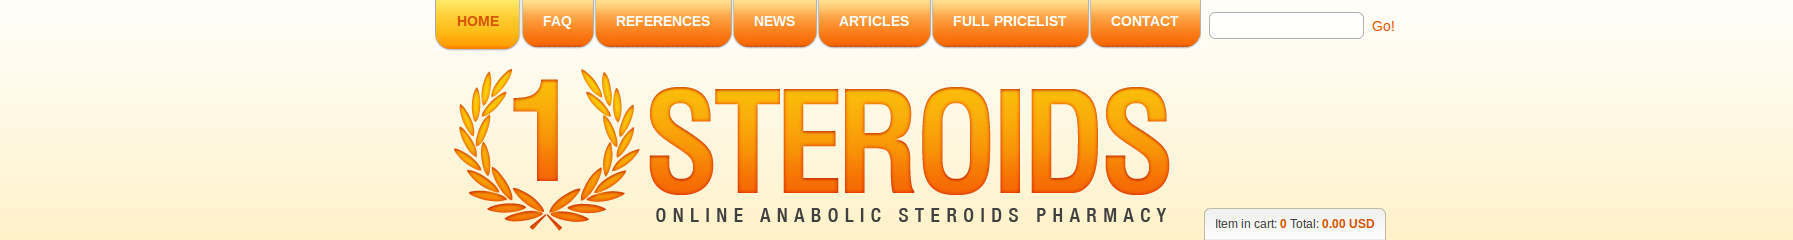 buy gen pharma steroids australia